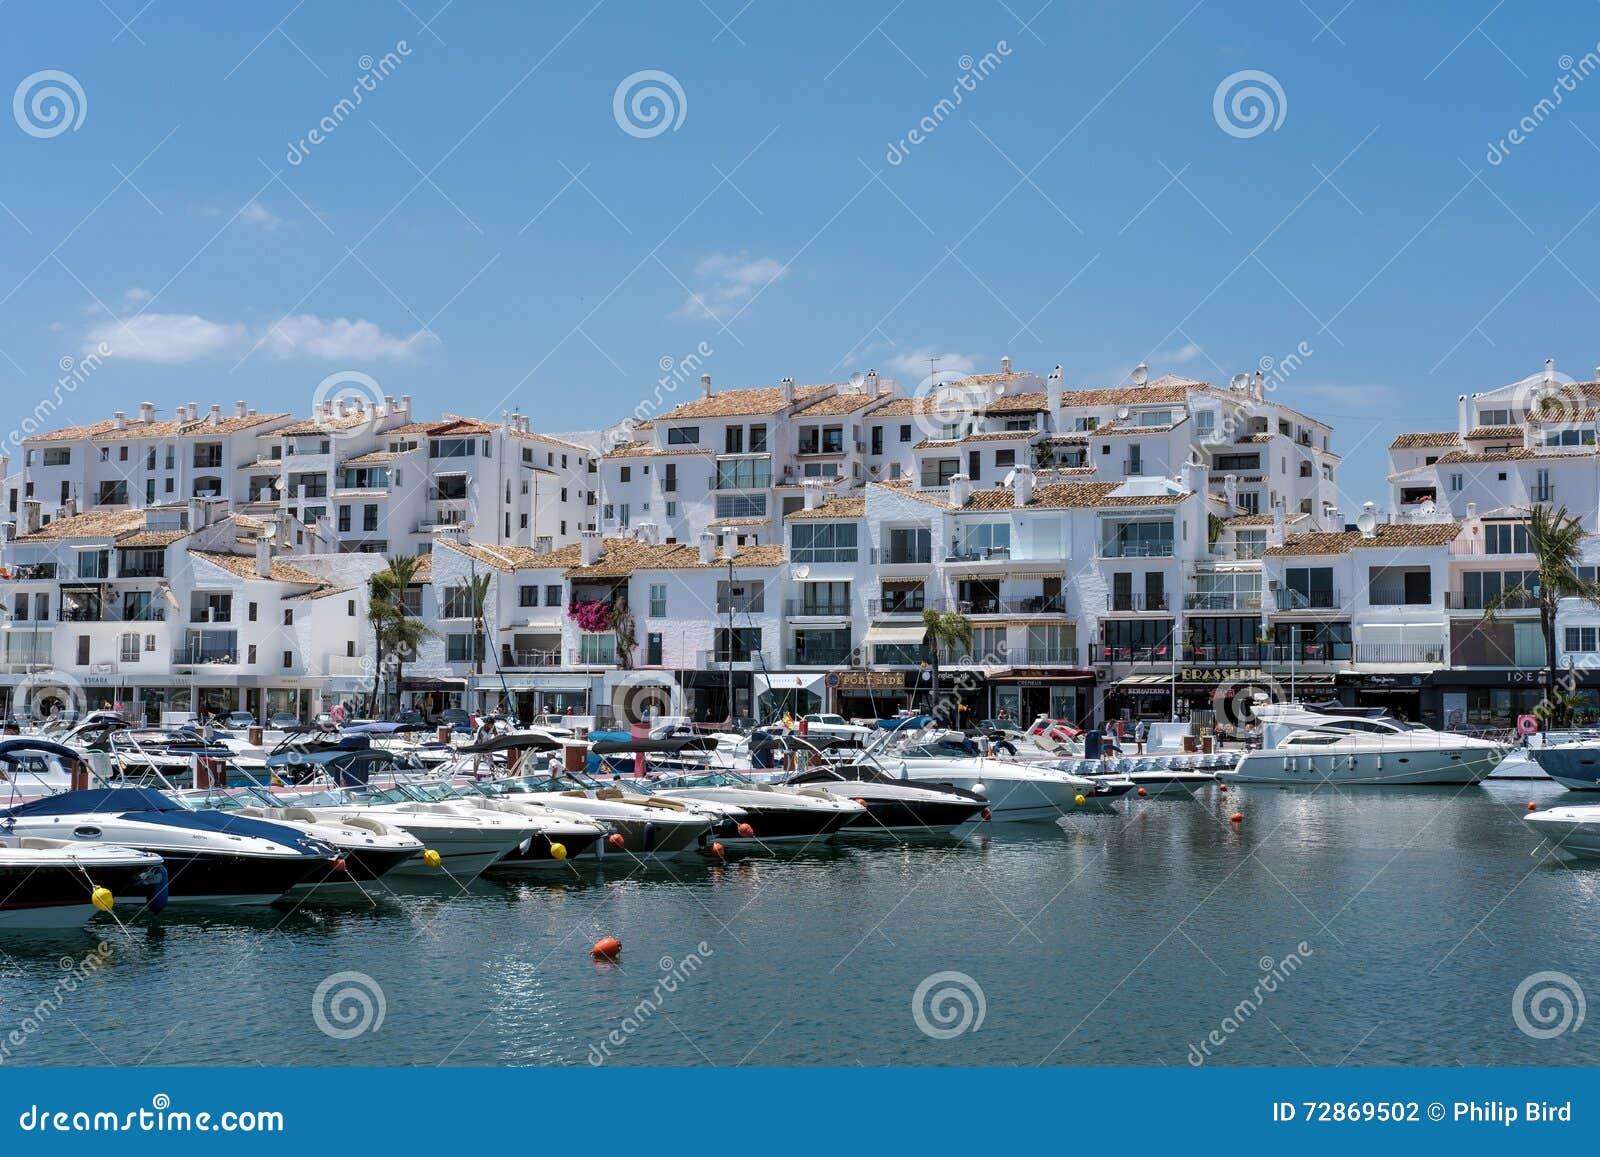 PUERTO BANUS ANDALUCIA/SPAIN - 26 ΜΑΐΟΥ: Άποψη των βαρκών στο Har